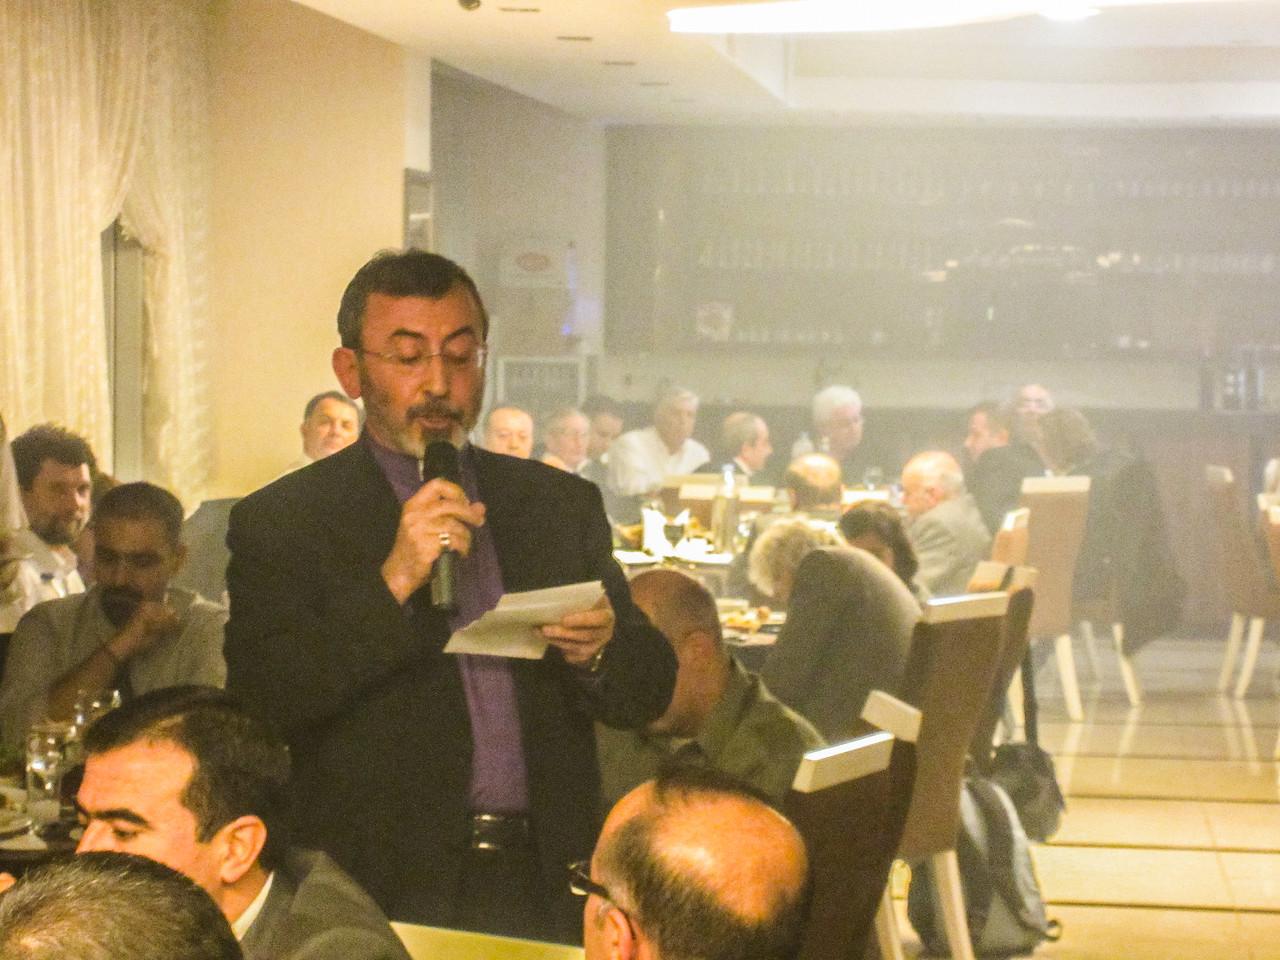 Archbishop Khajag Barsamian's Remarks at Mayor's Dinner